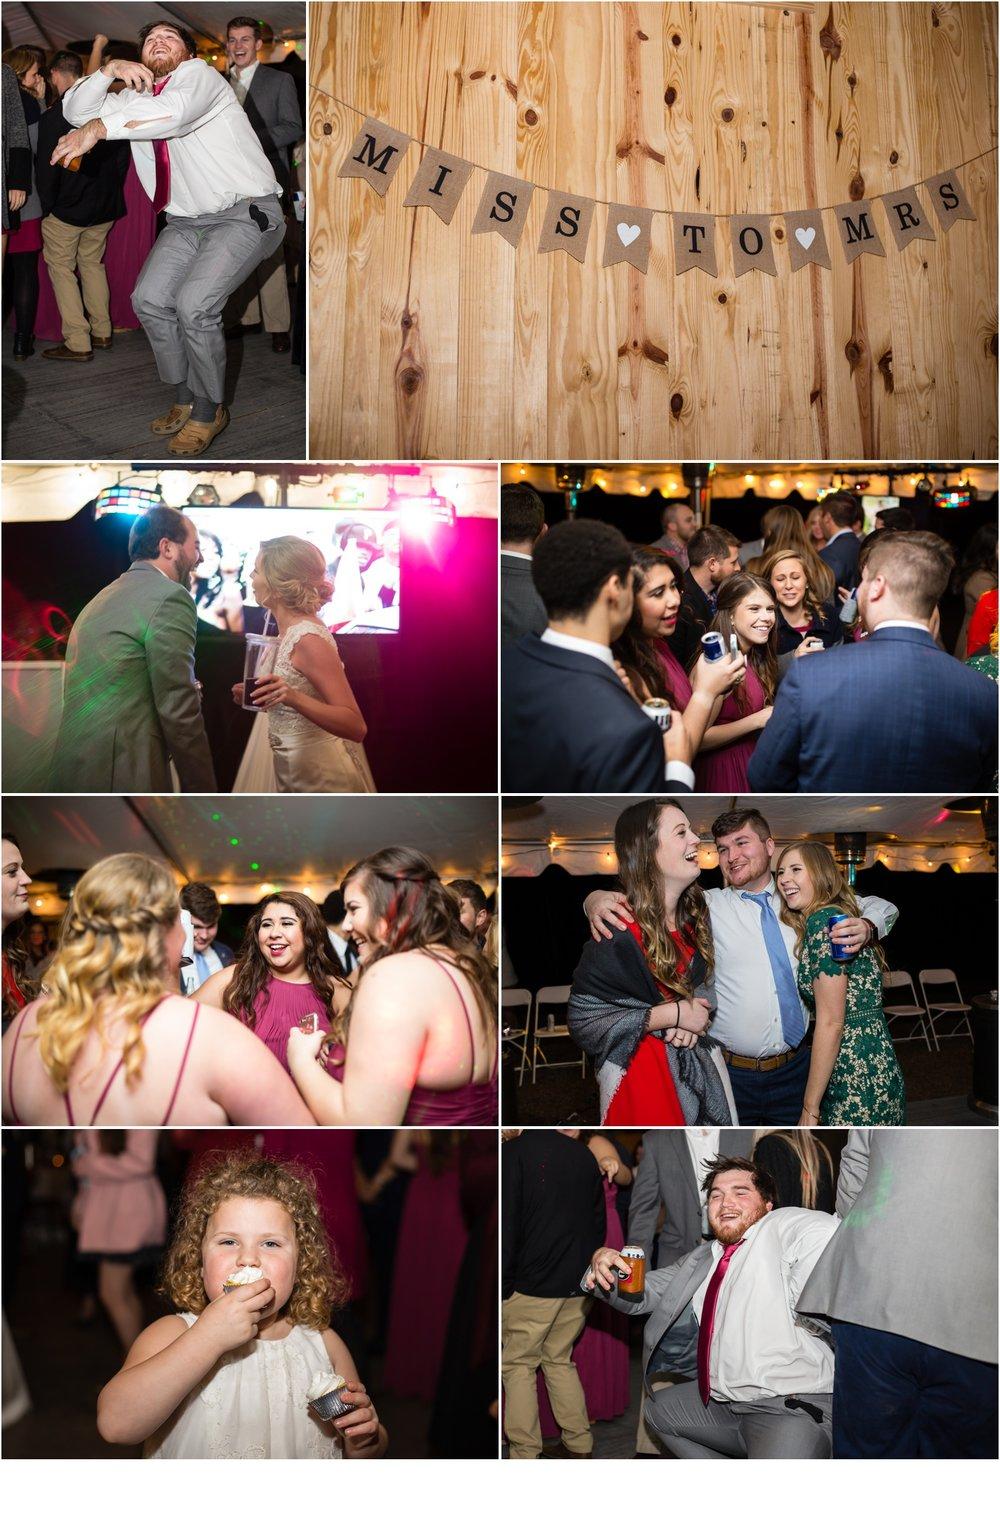 Rainey_Gregg_Photography_St._Simons_Island_Georgia_California_Wedding_Portrait_Photography_0540.jpg